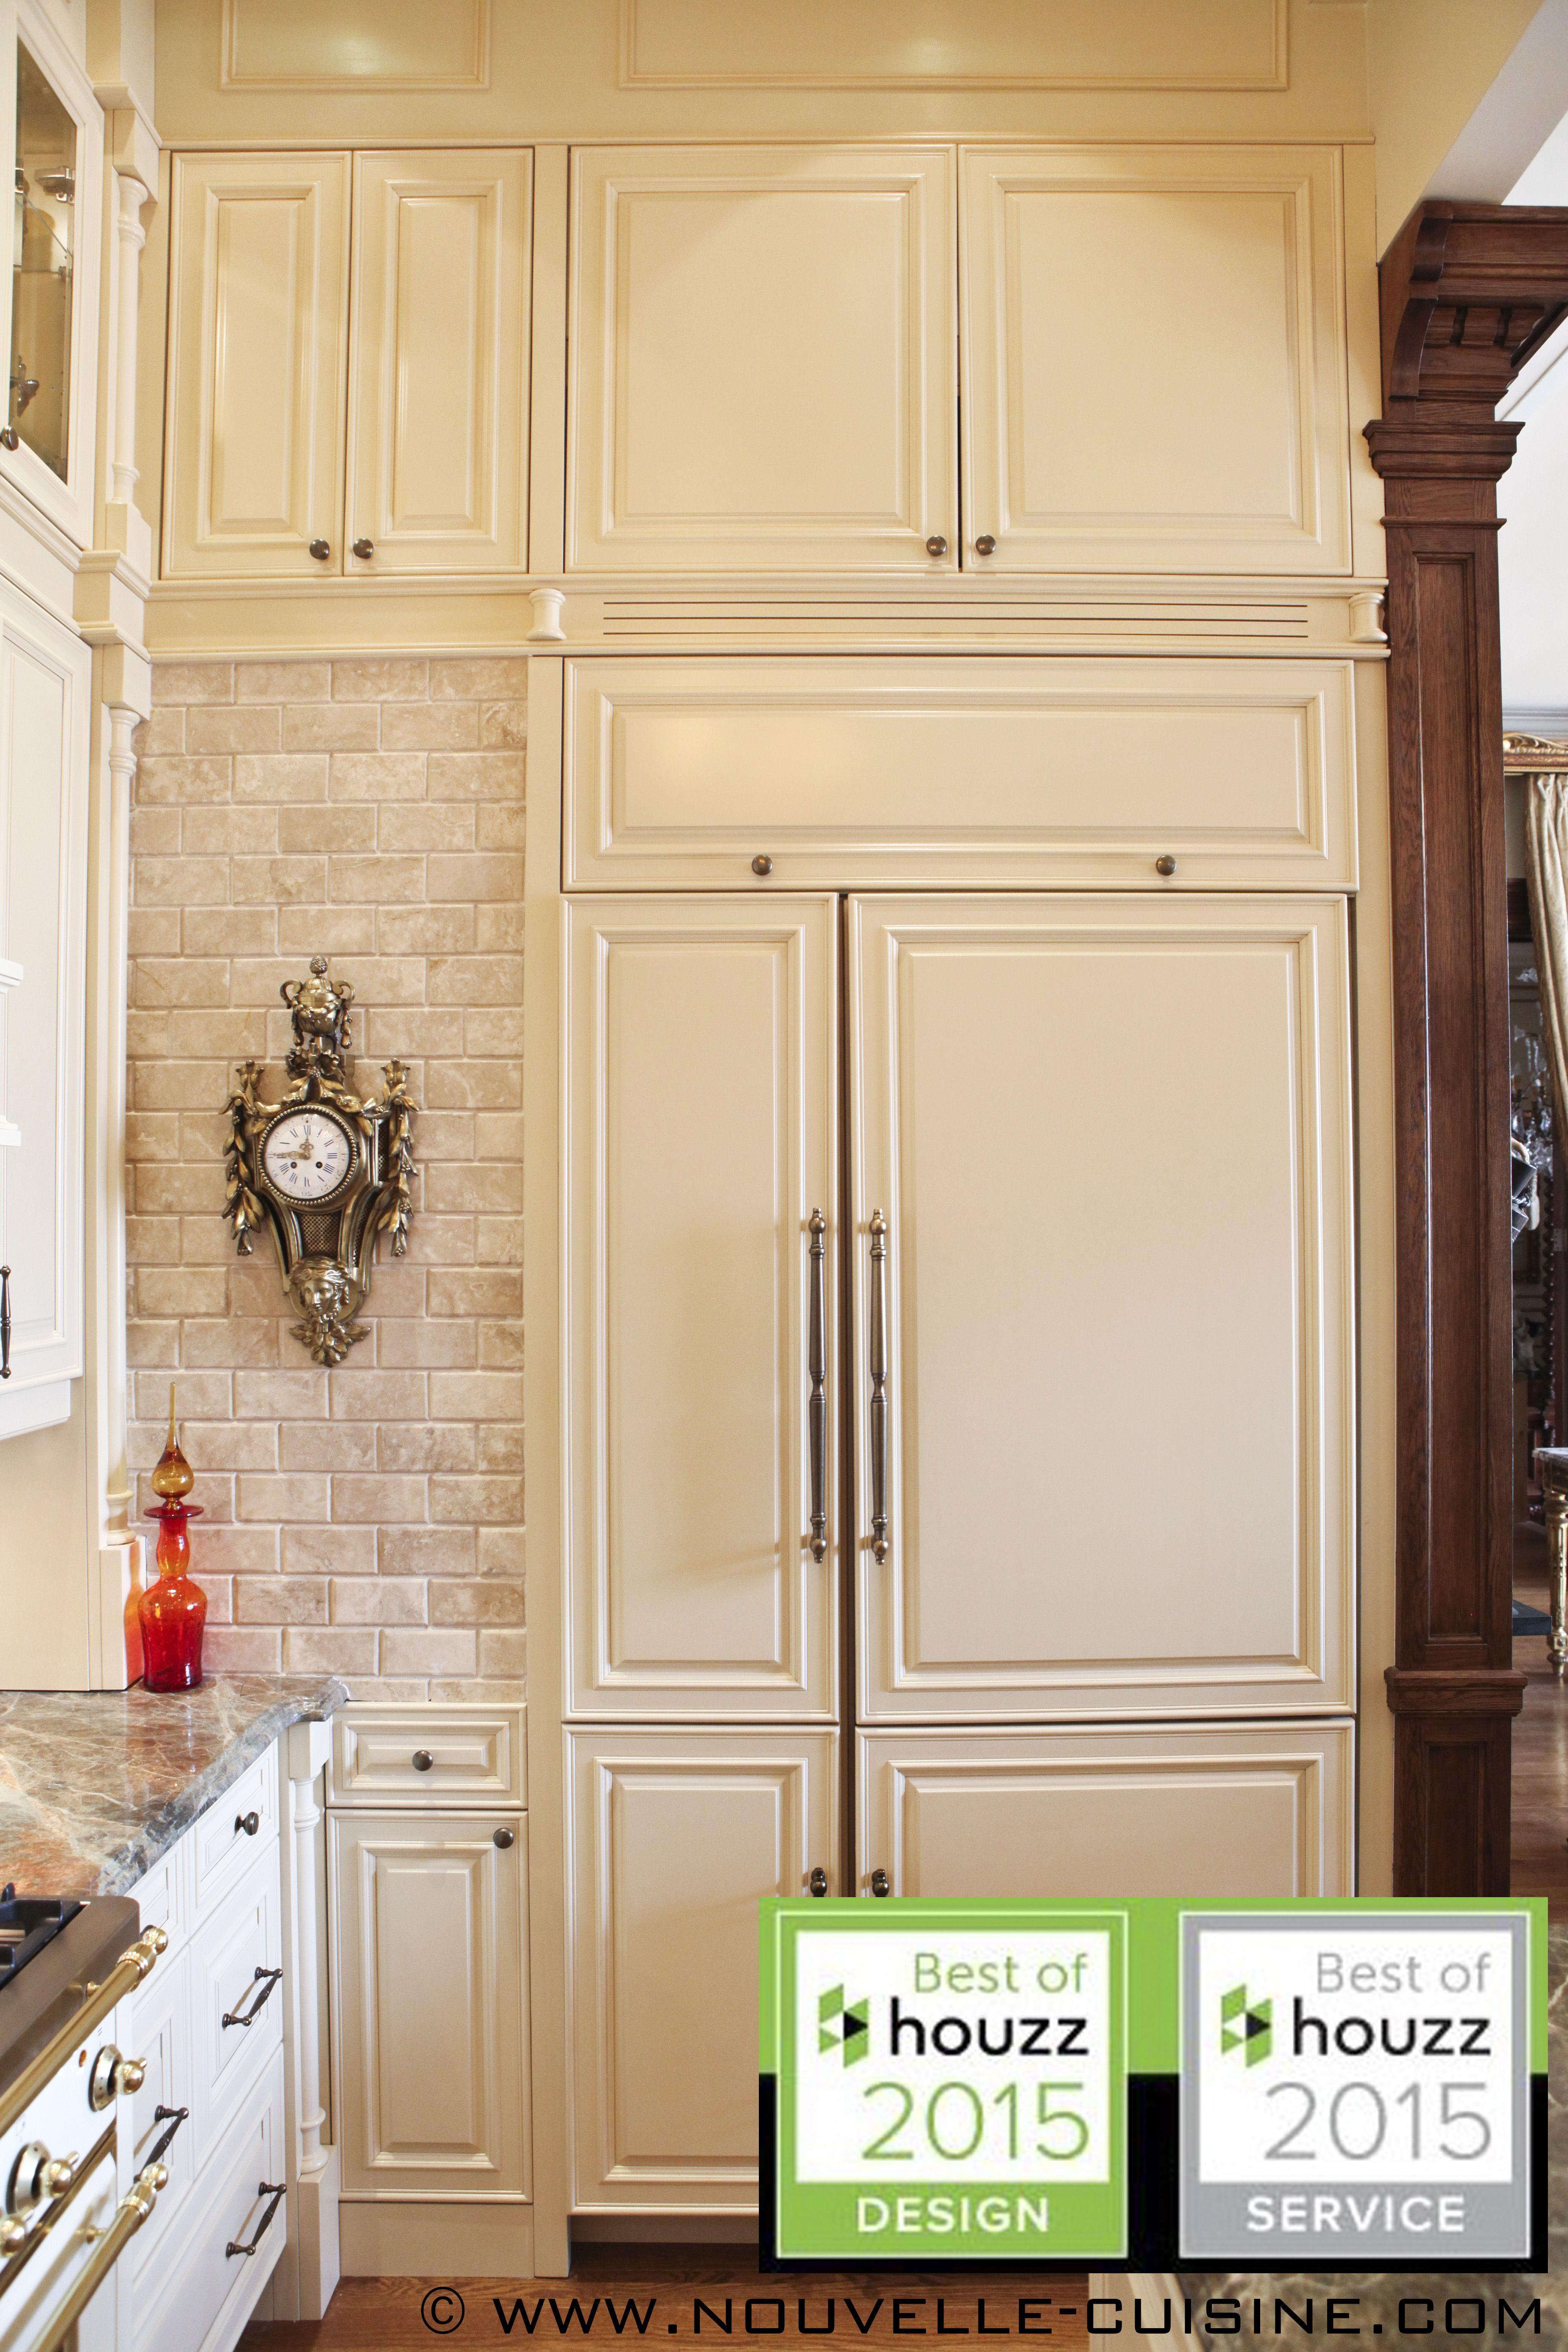 A Kitchen All About Height With Lacquered Cabinets And Granite Countertops Une Cuisine Toute En Hauteur Aux Armoires En Laqu Kitchen Kitchen Cabinets Decor